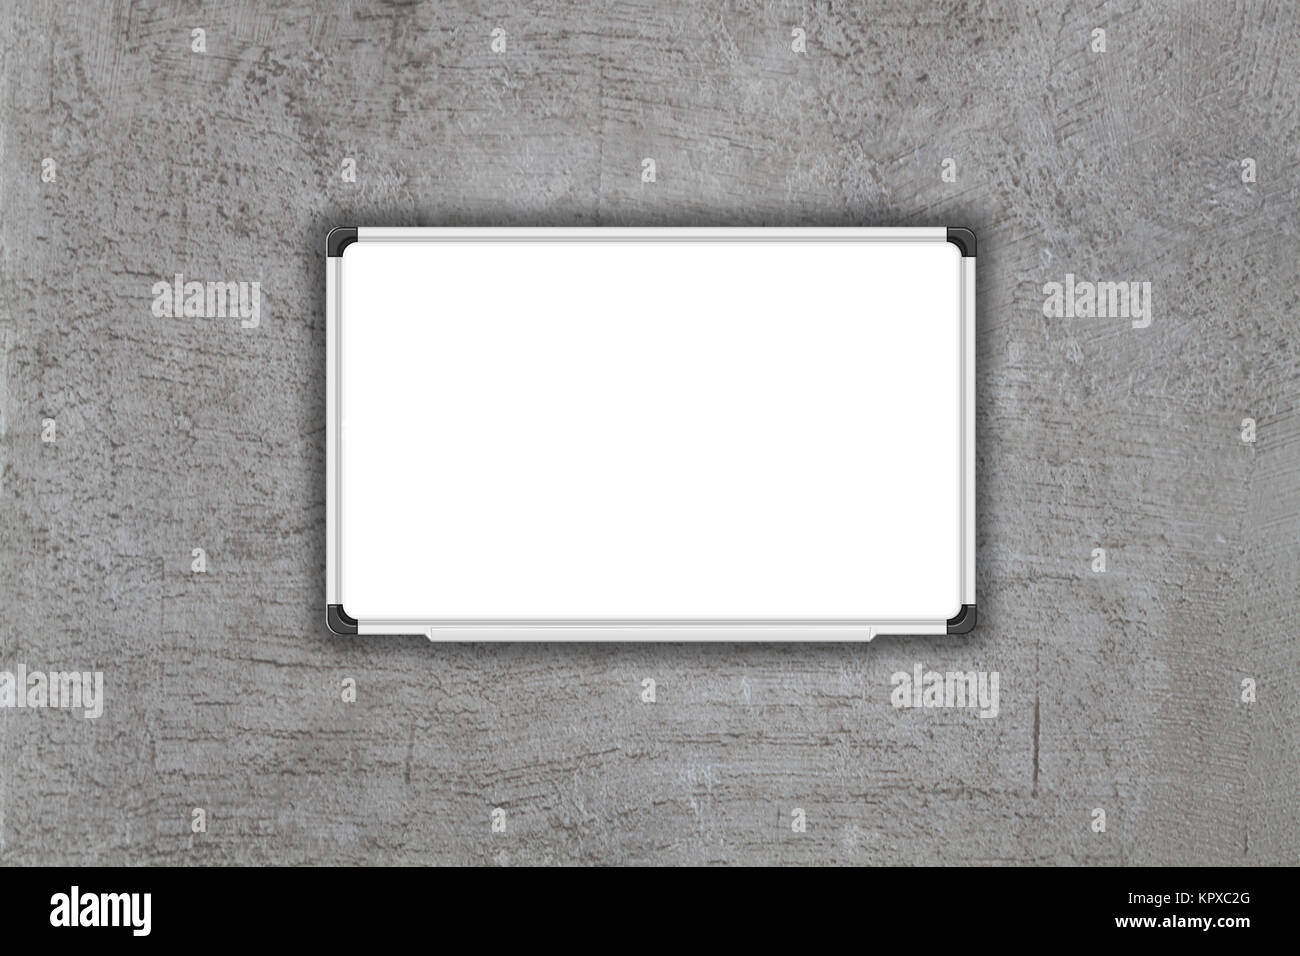 Blank white baord on gray concrete texture background - Stock Image